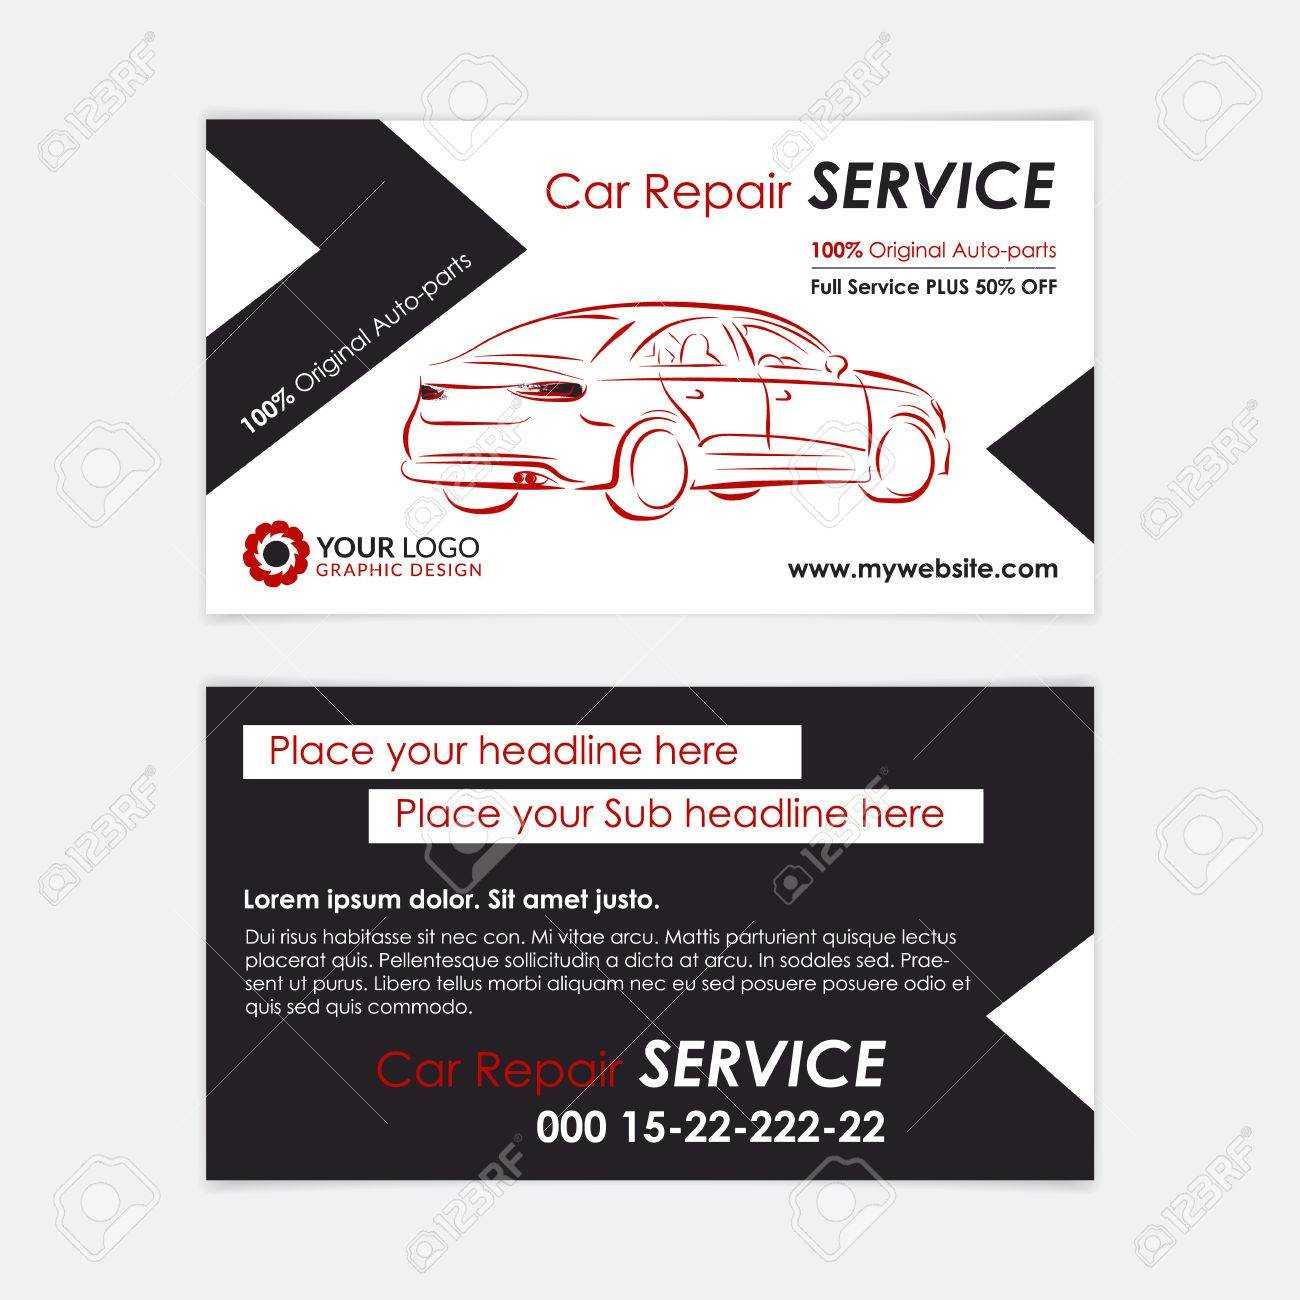 Automotive Repair Business Cards - Karan.ald2014 Pertaining To Automotive Business Card Templates